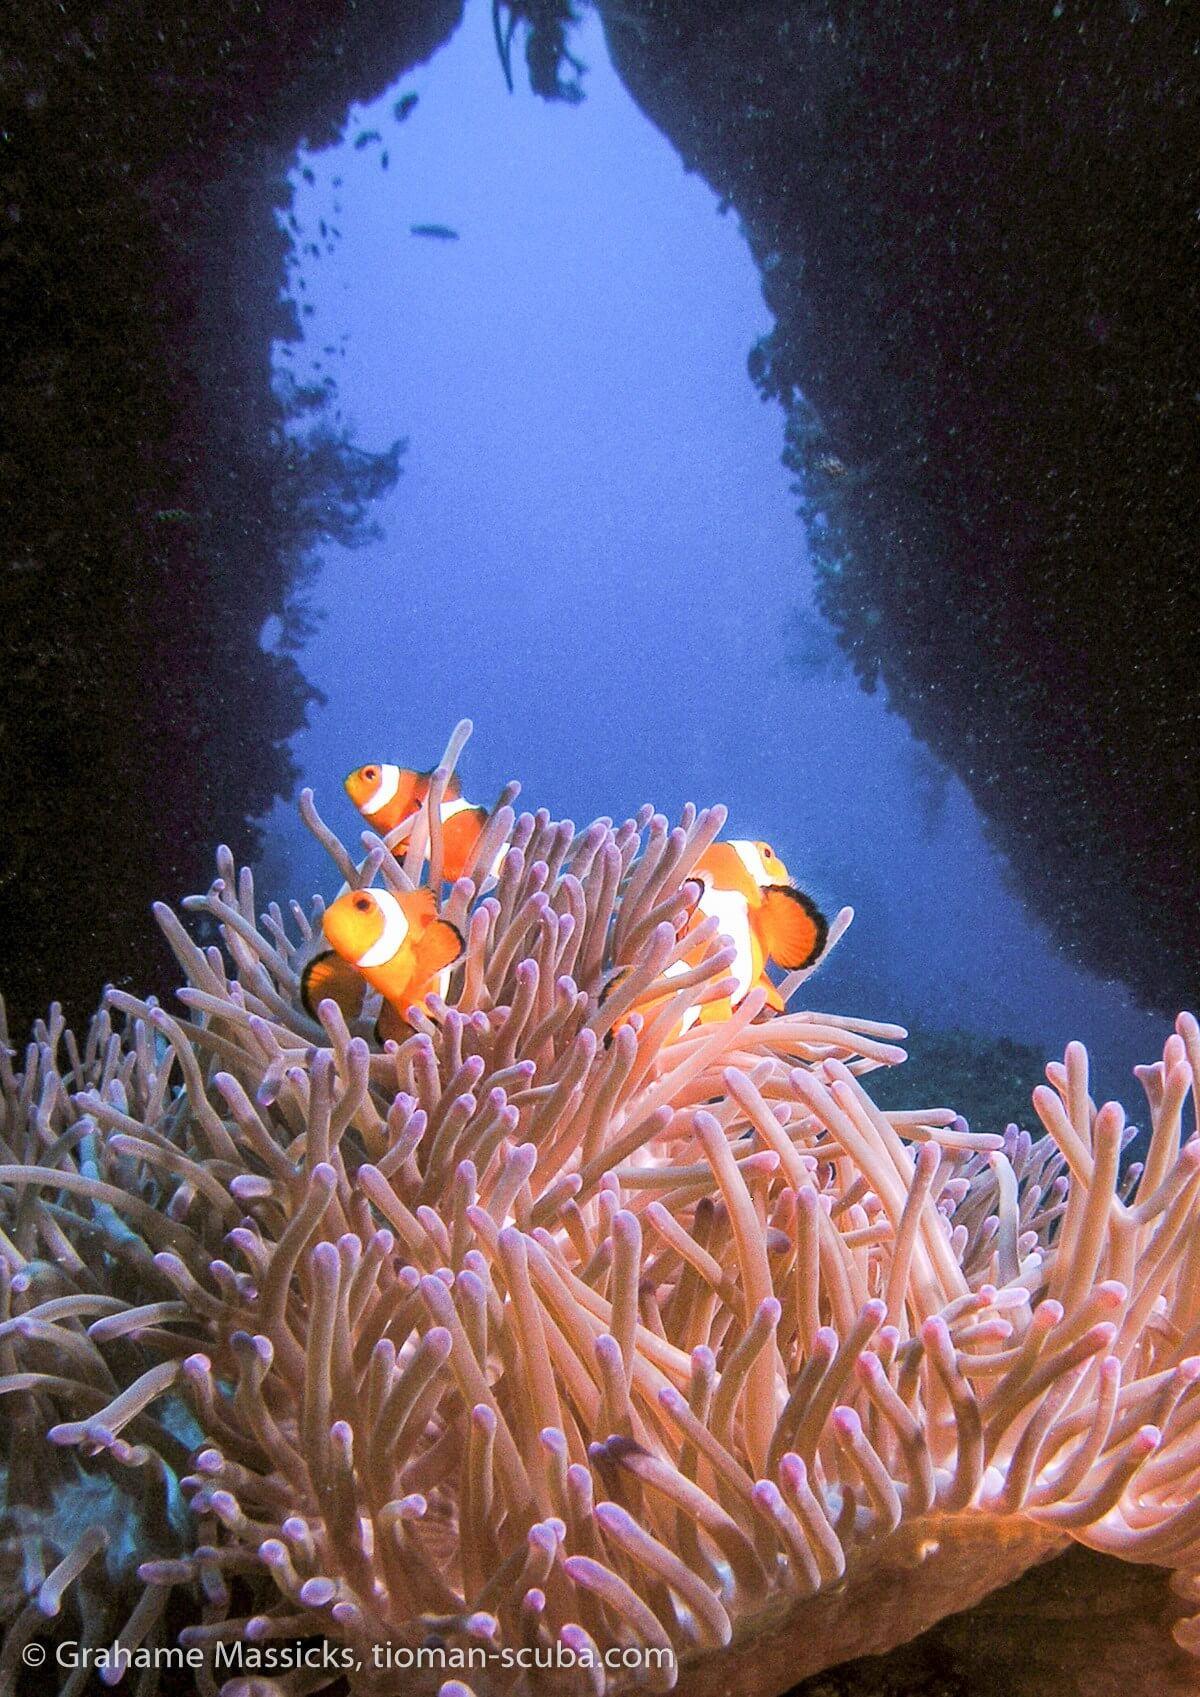 False clown fish, Salang, Tioman Island